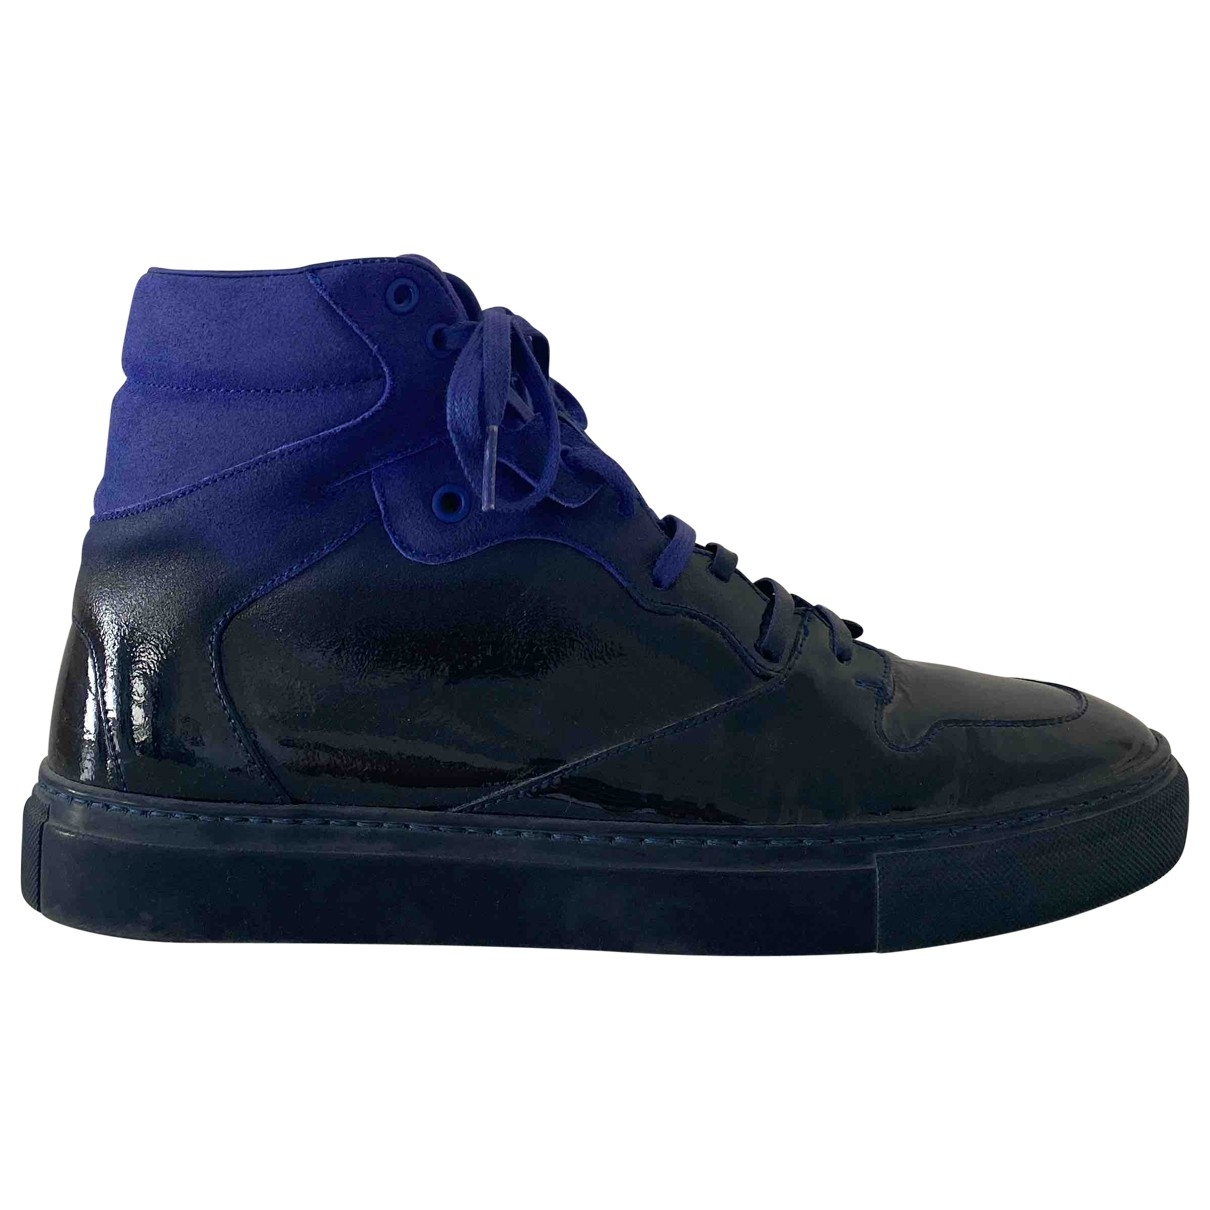 Balenciaga \N Sneakers in  Blau Leder